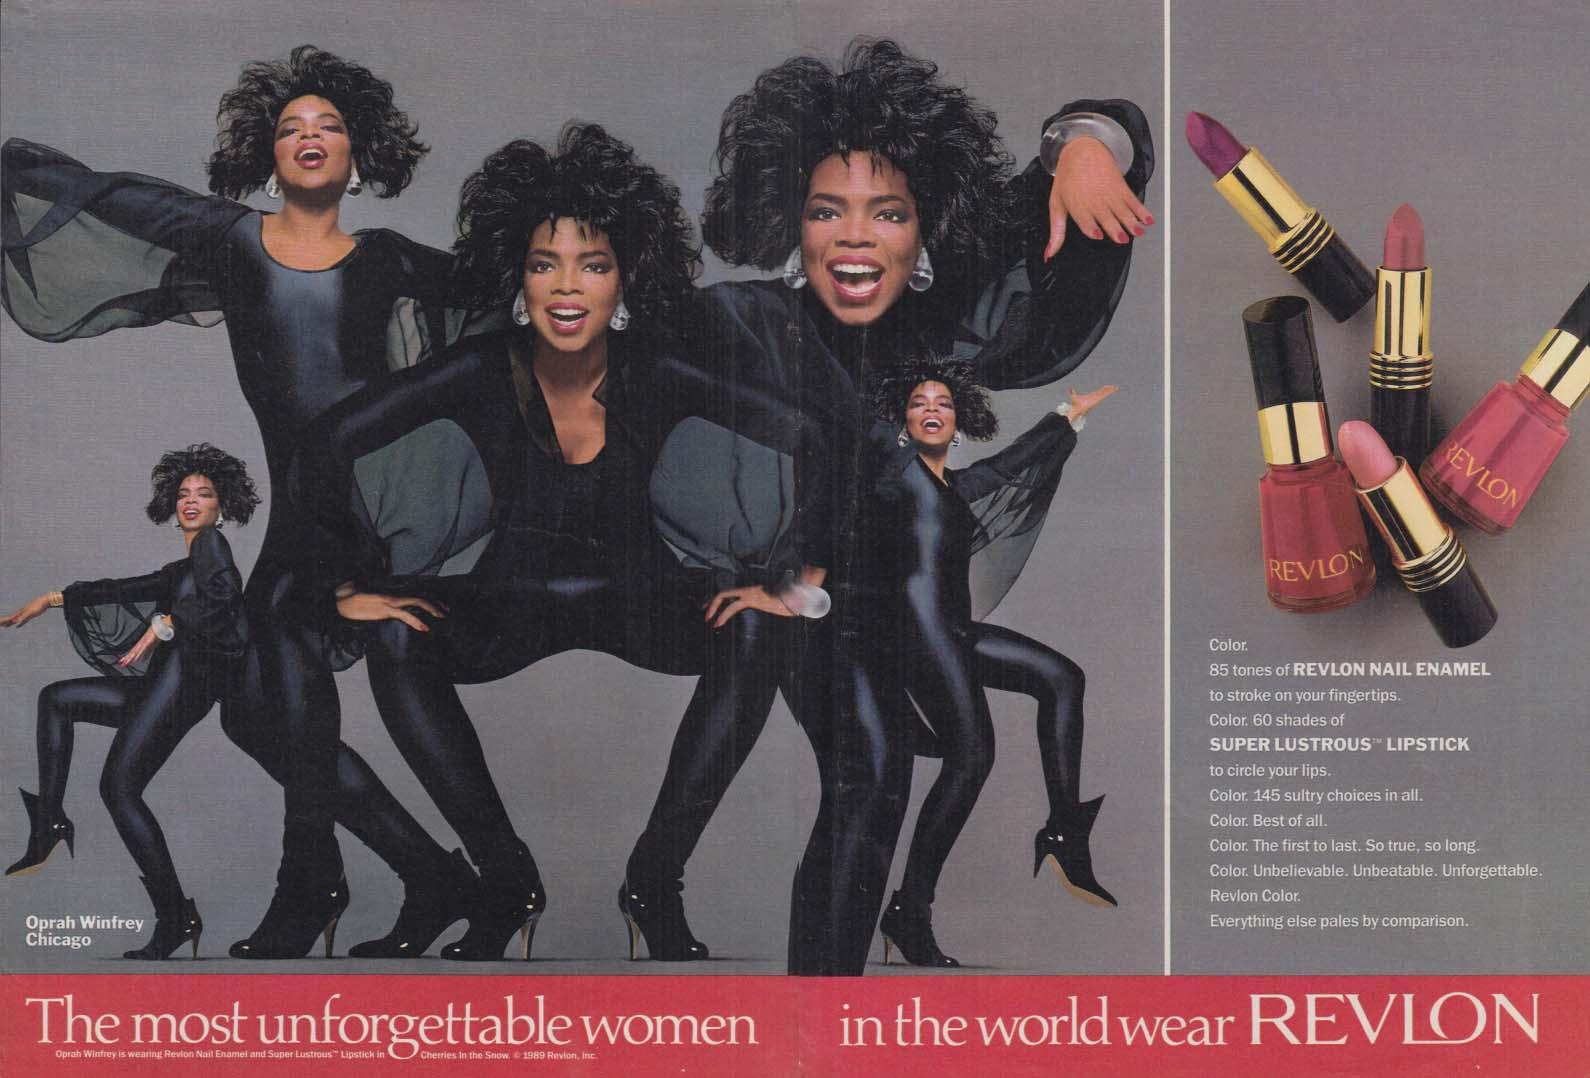 Oprah Winfrey for Revlon Lipstick & Nail Polish ad 1989